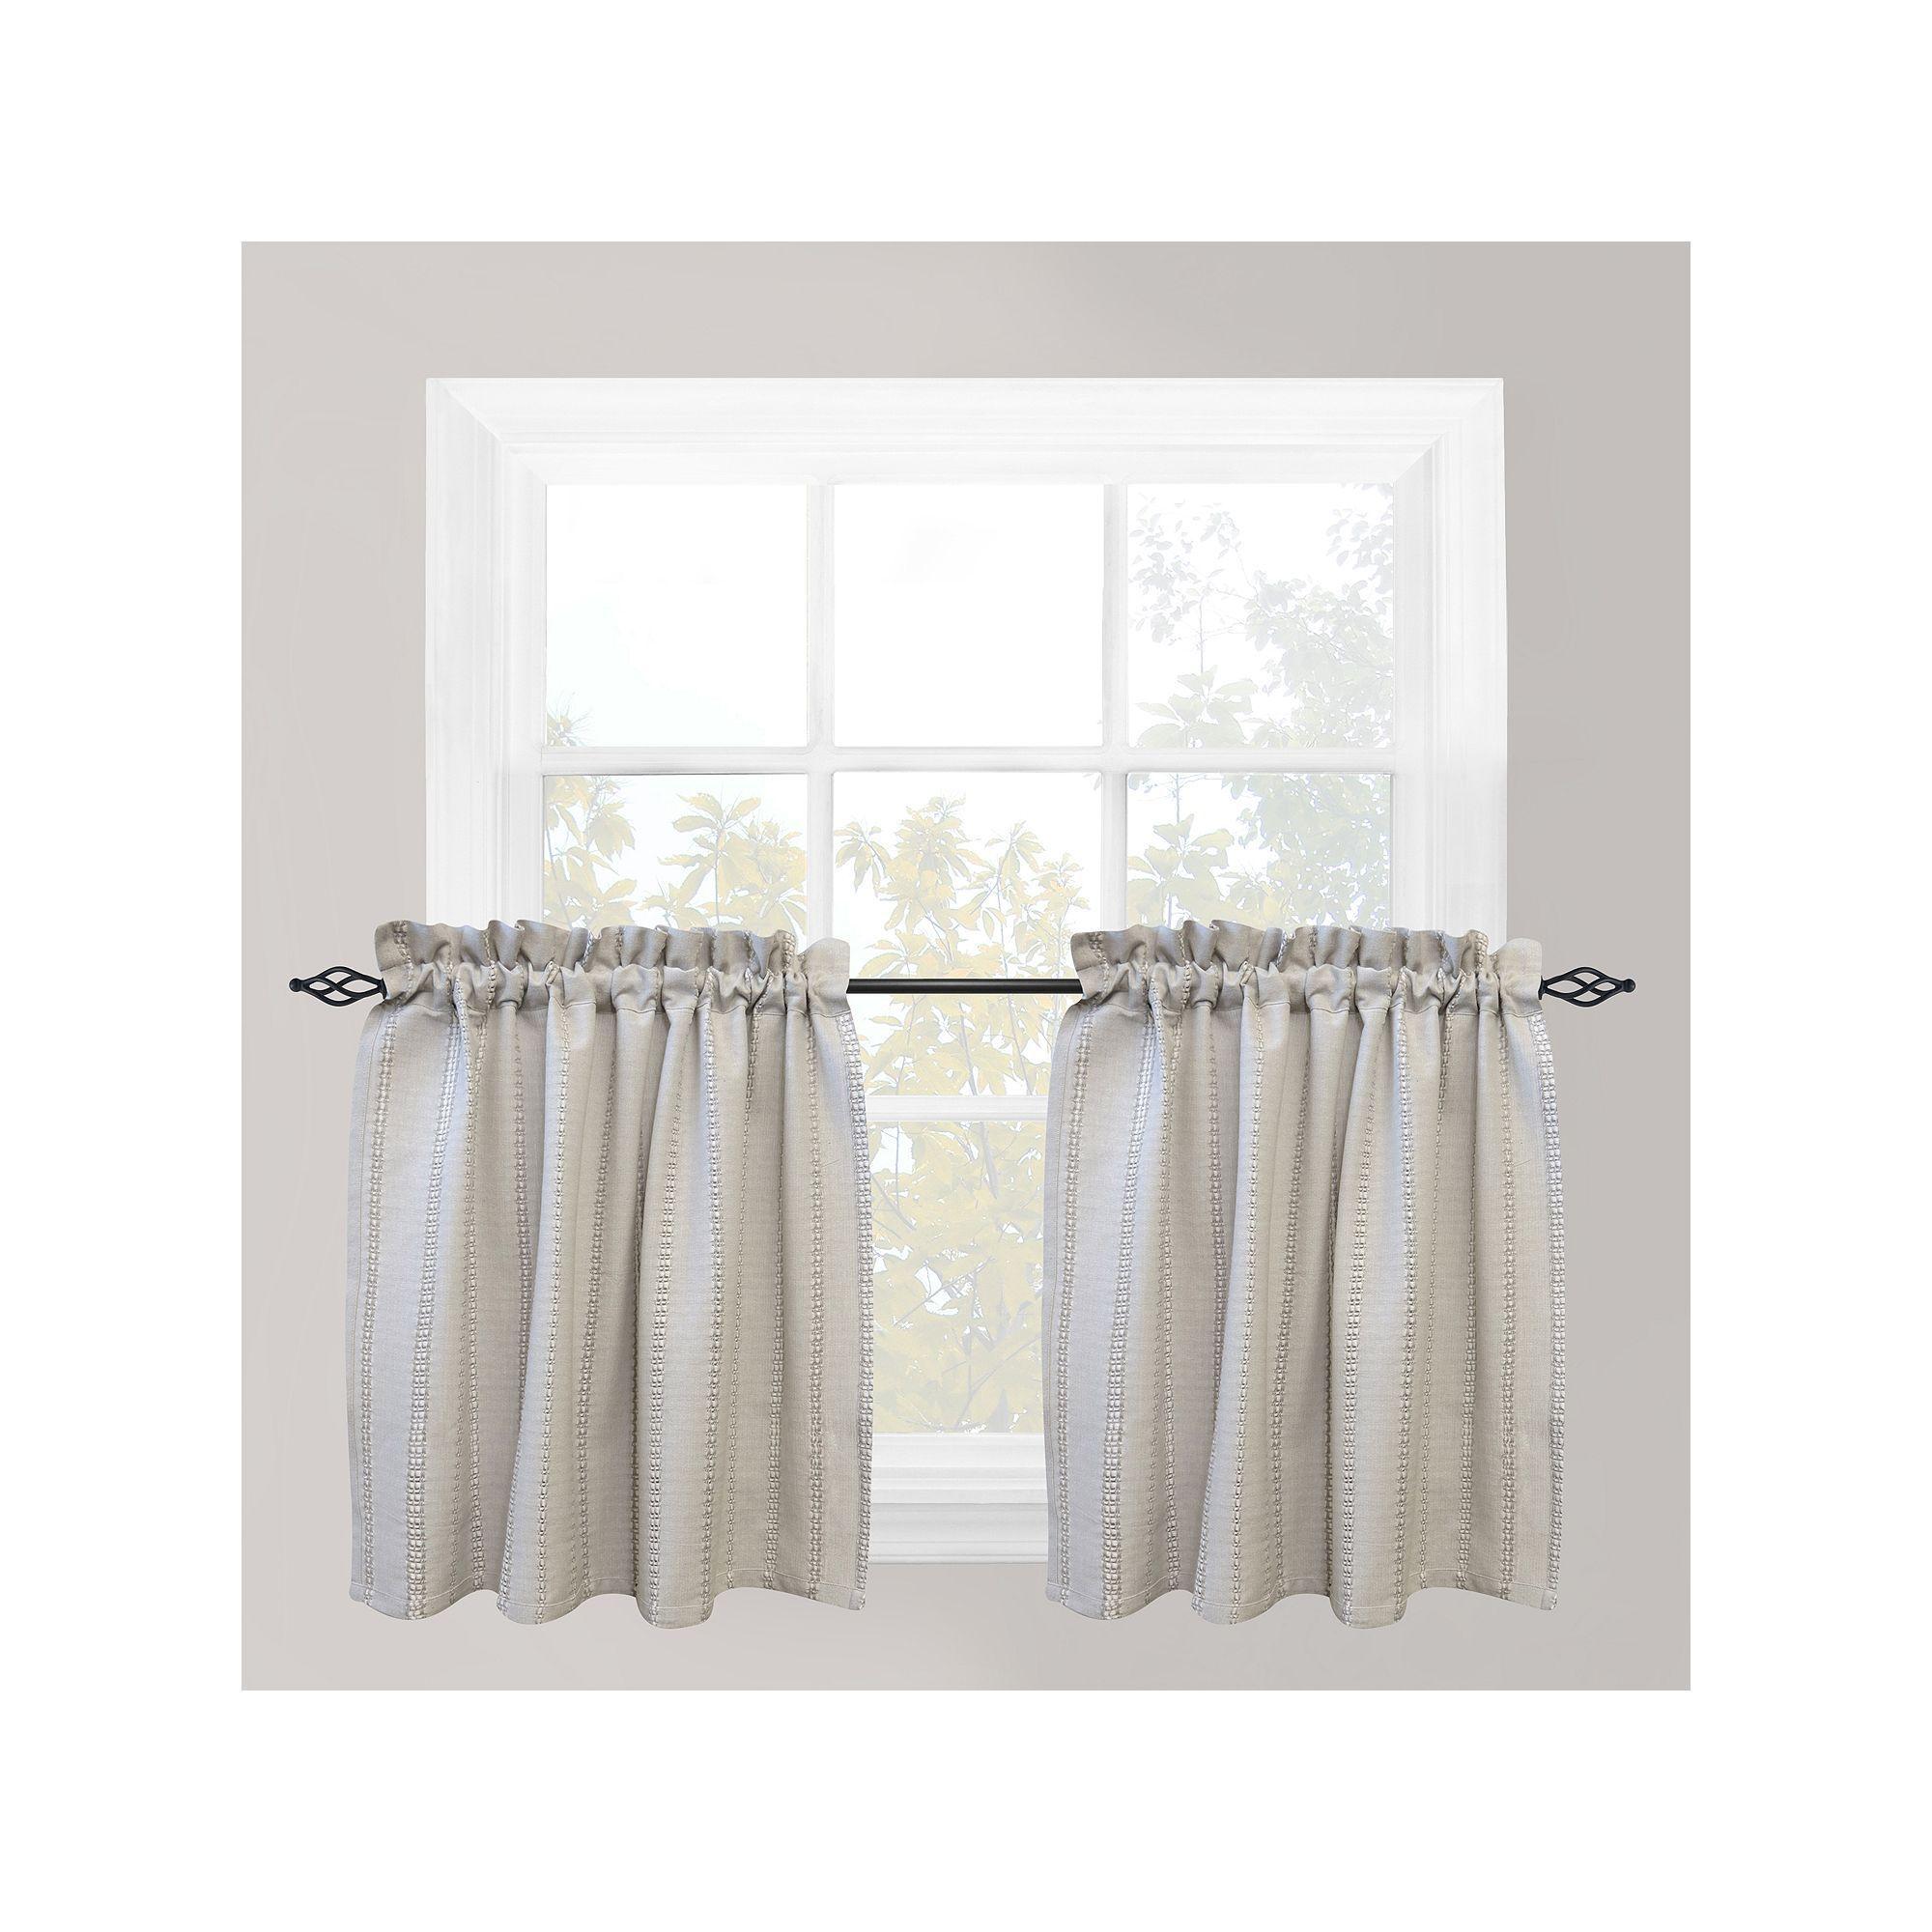 Park b smith eyelet chambray tier kitchen window curtain set